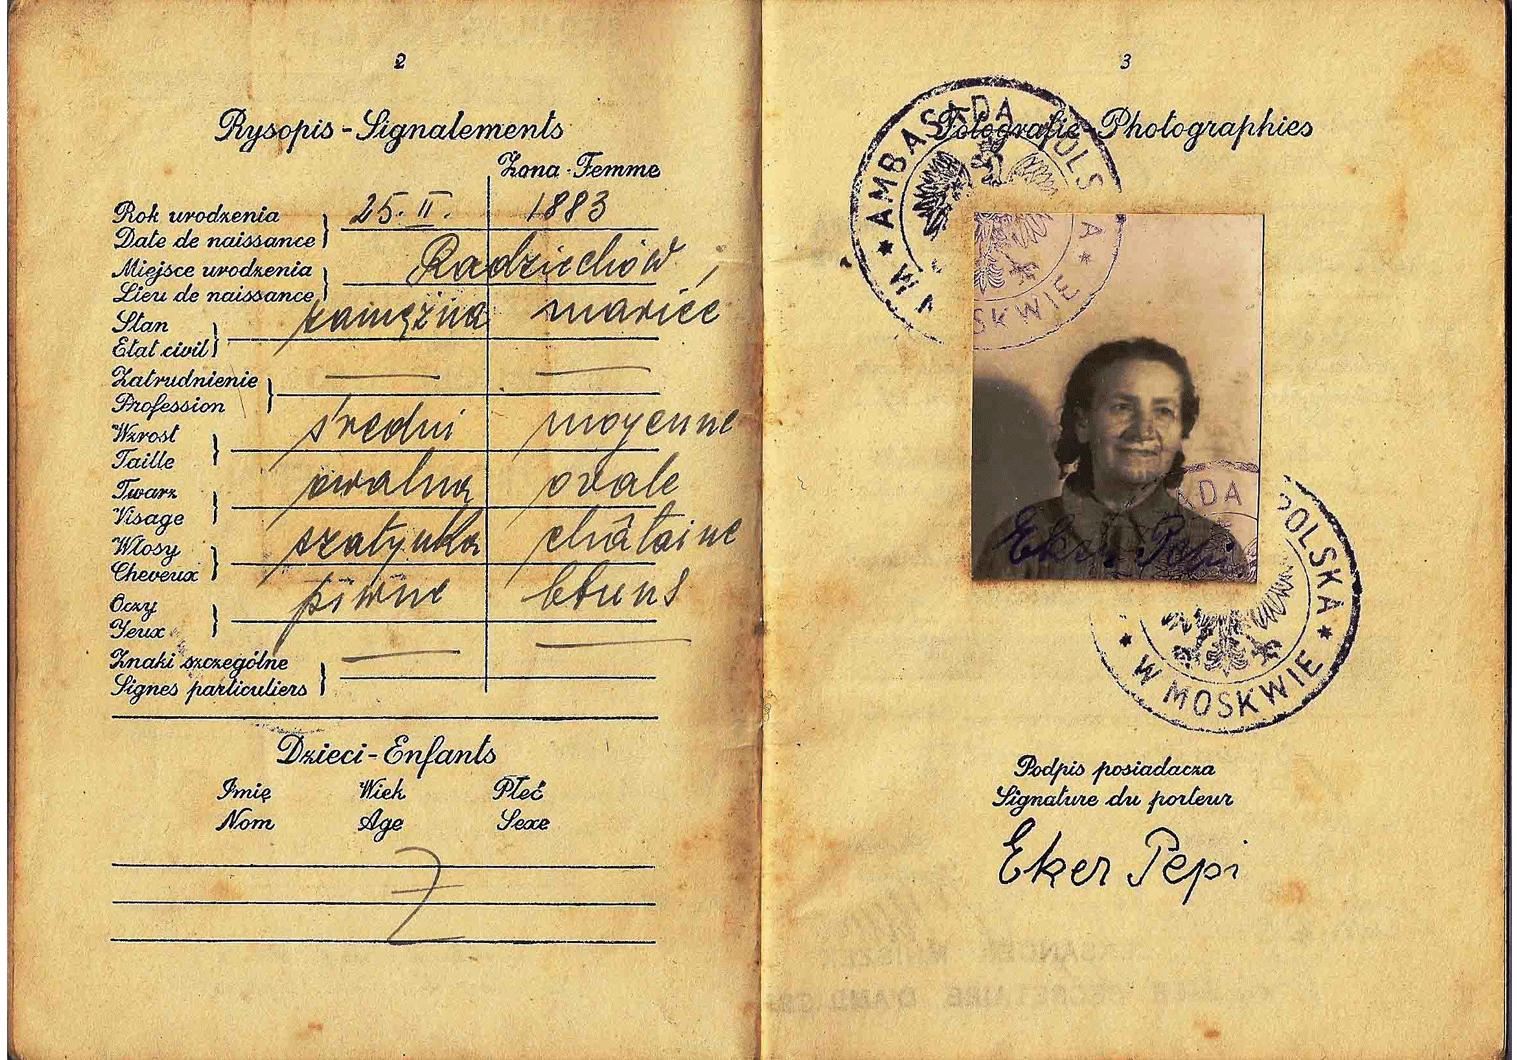 WW2 Polish passport from the Soviet Union